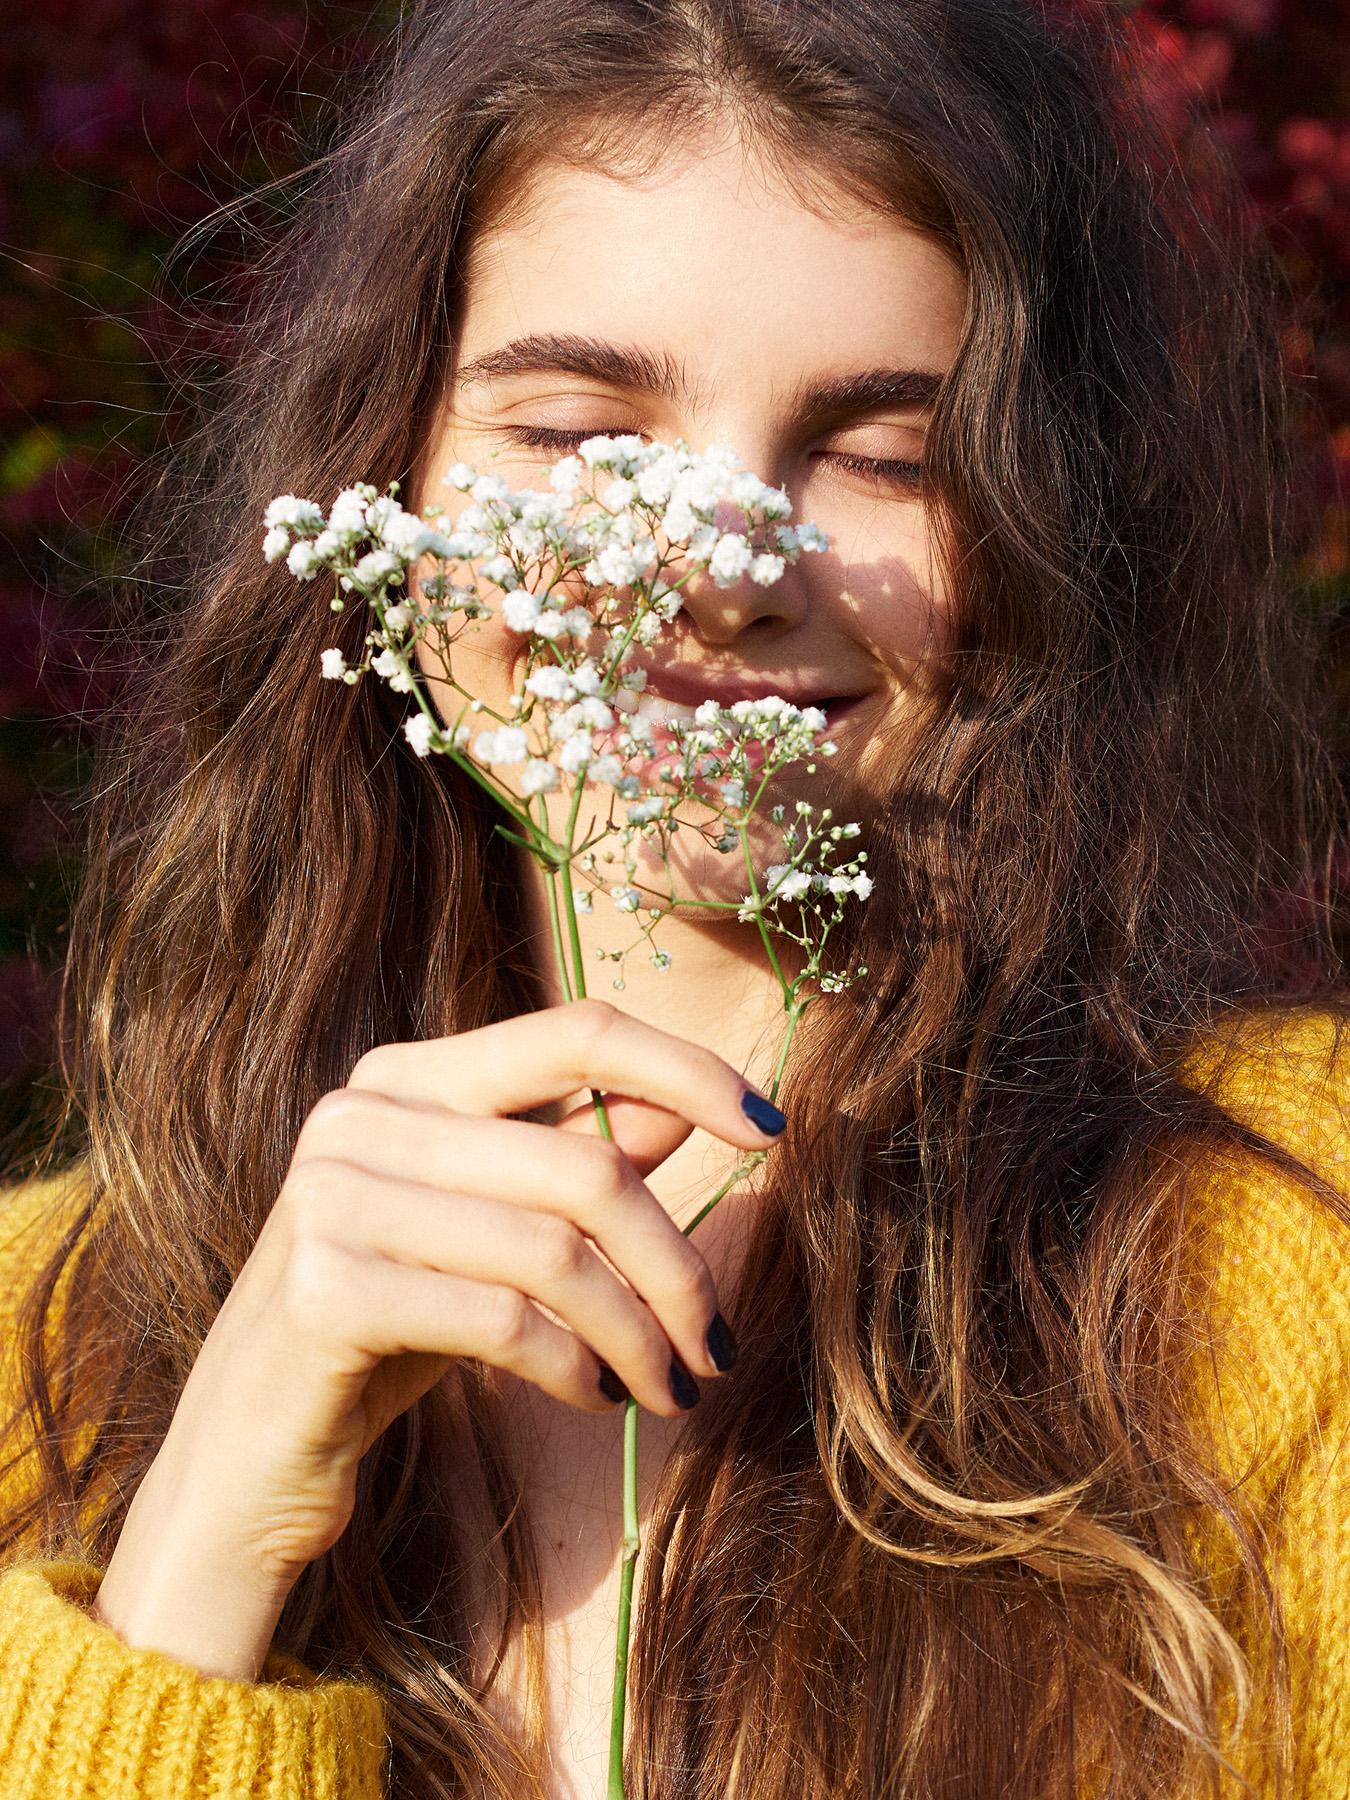 043-icon-artist-management-Kristin-Vicari-Girls and Flowers-43.jpg